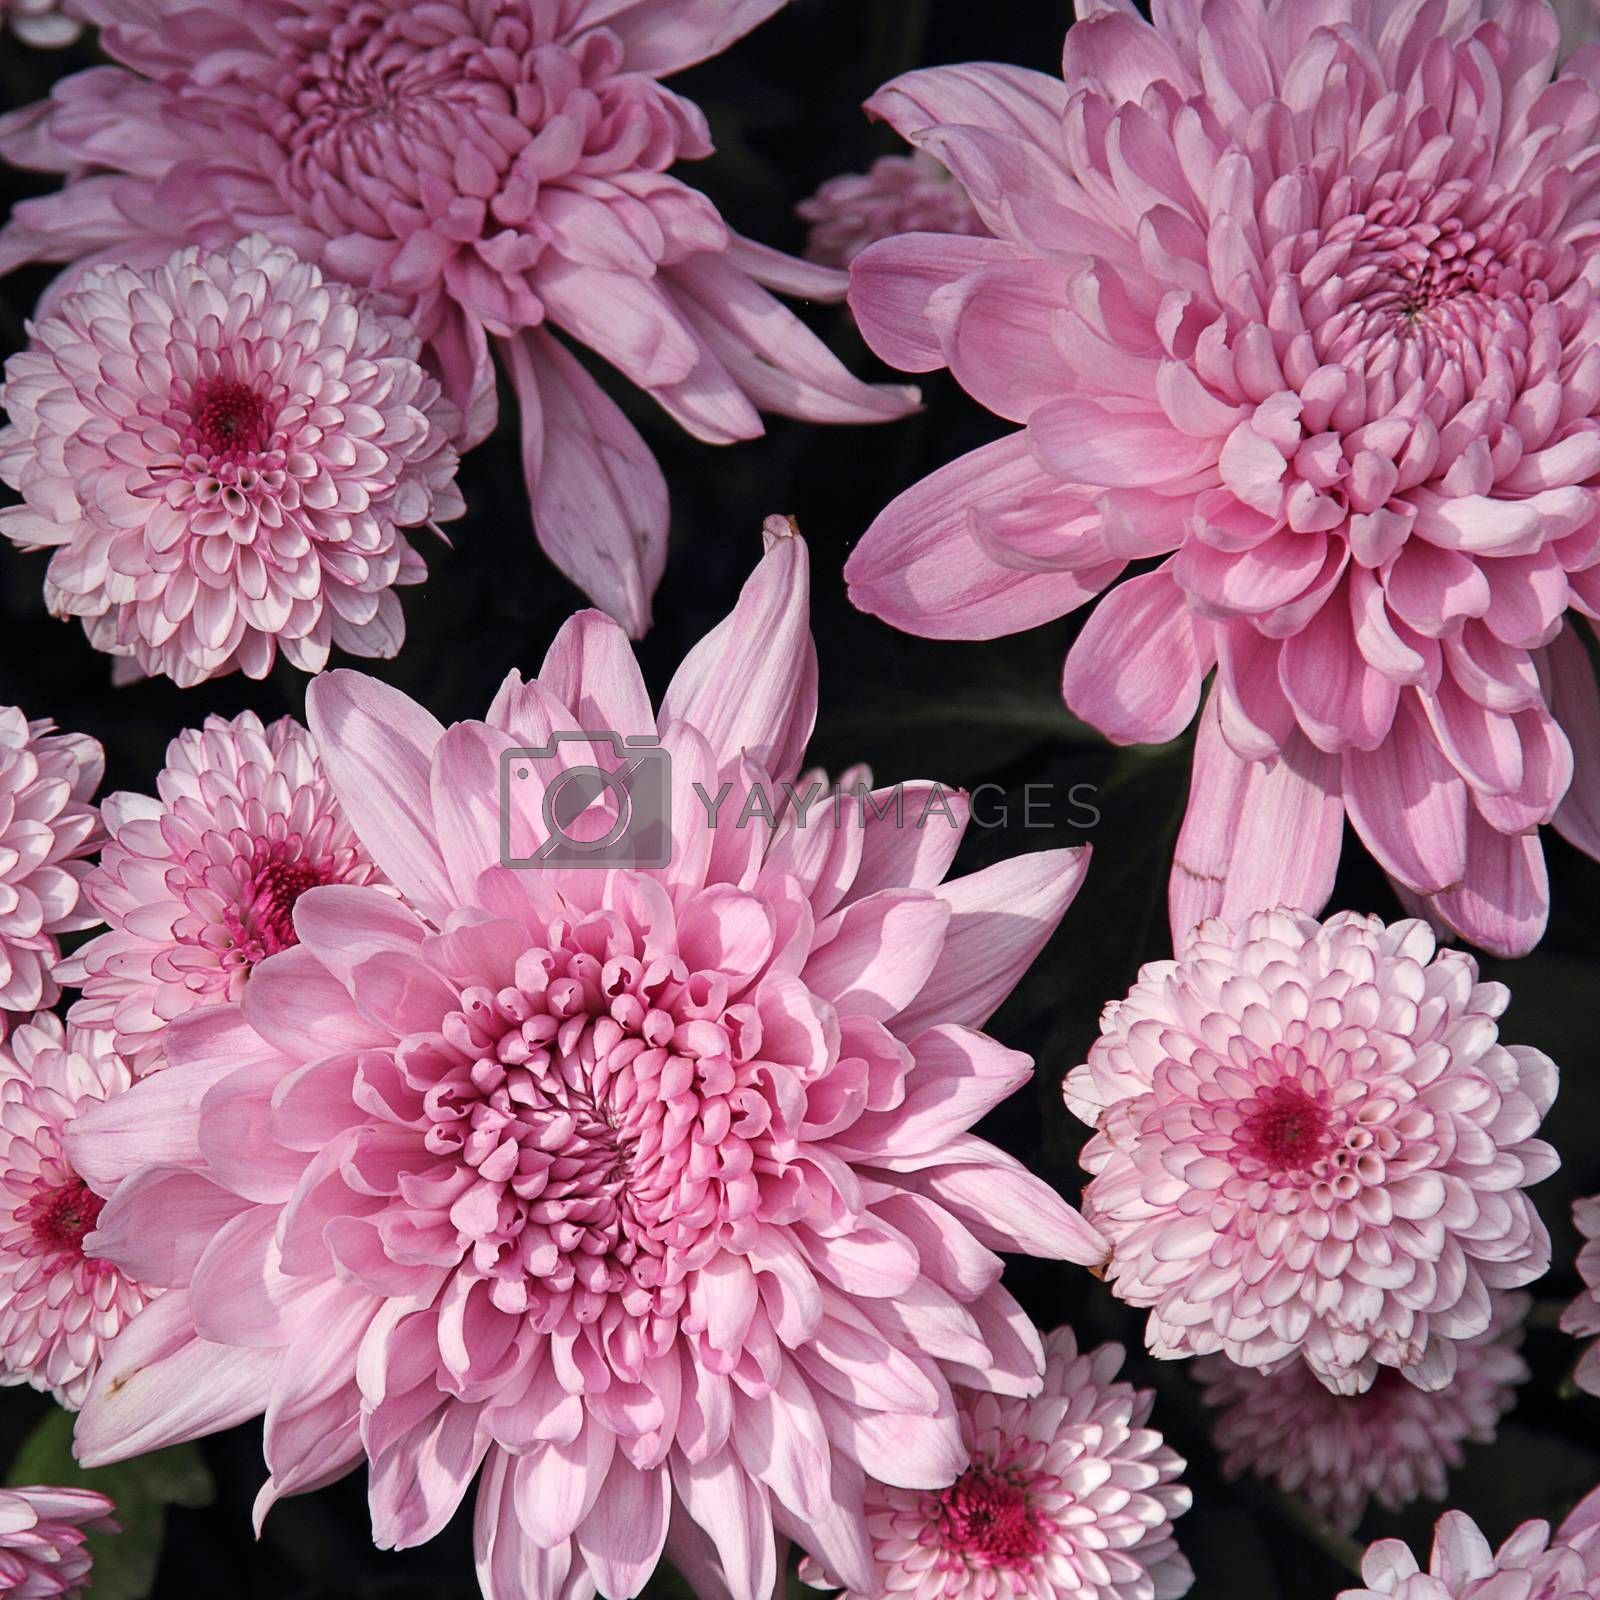 Royalty free image of Chrysanthemum flower by liewluck